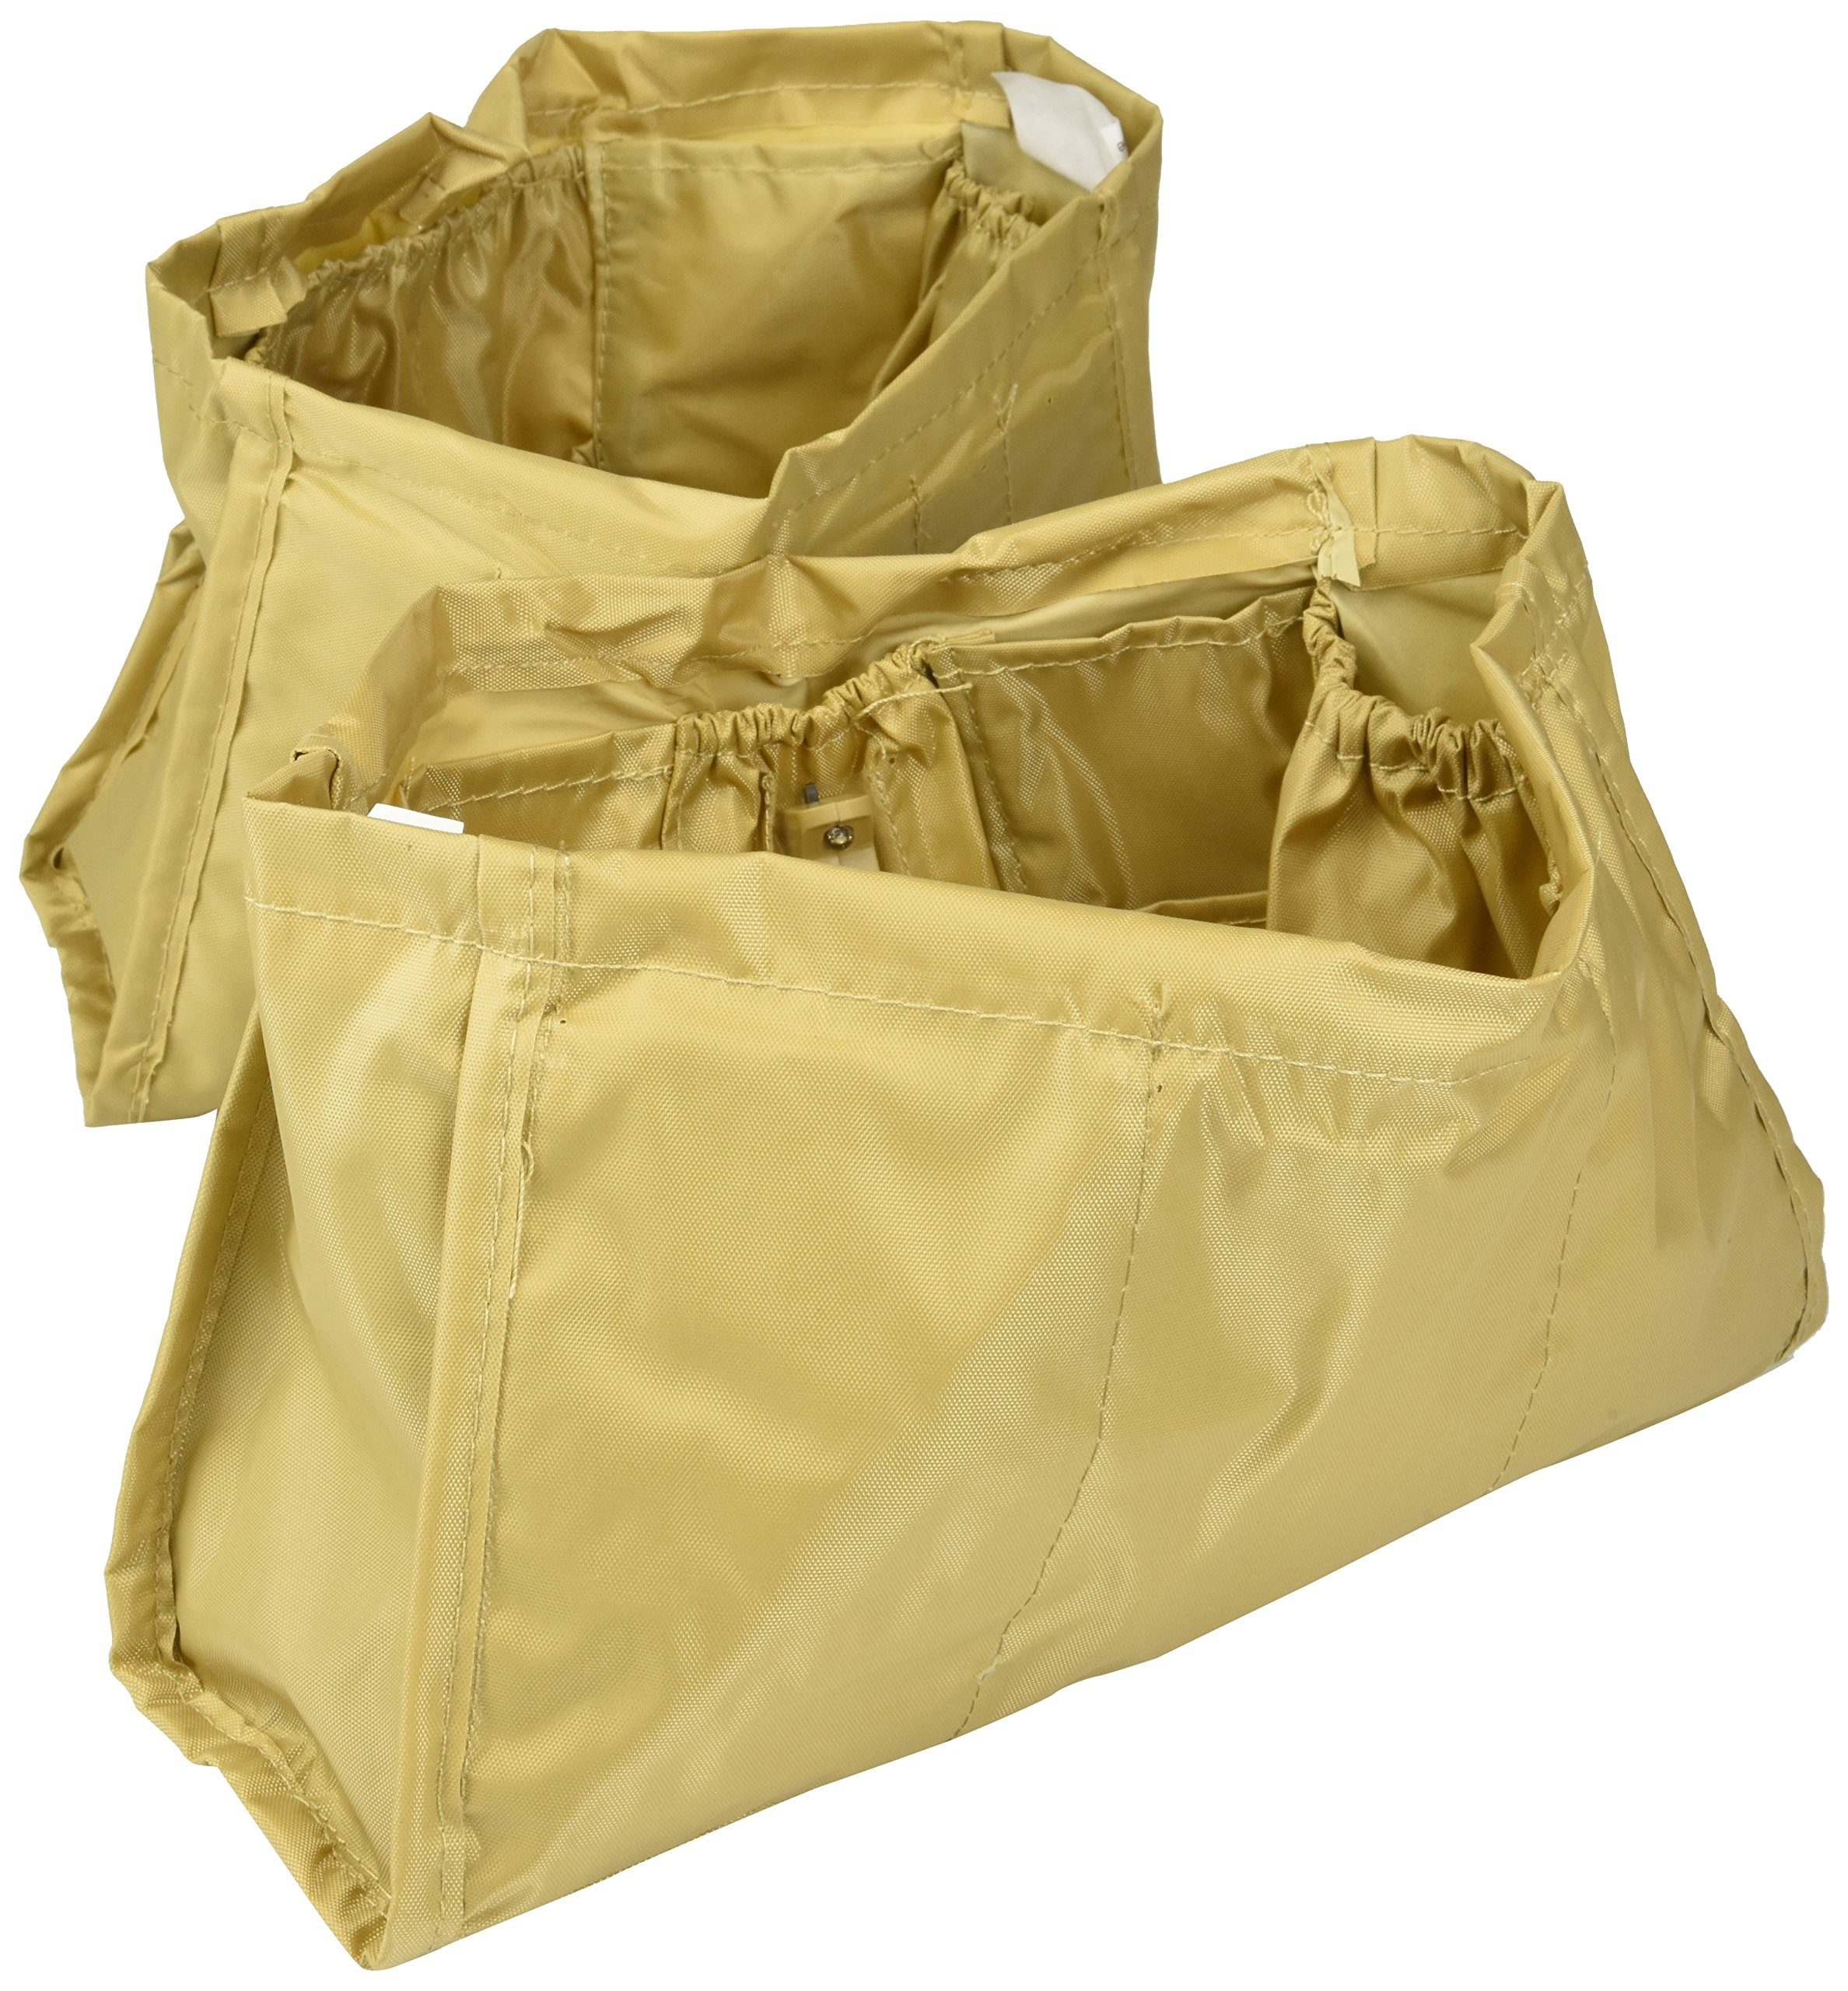 PU Health Kangaroo Inner Bag Organizers